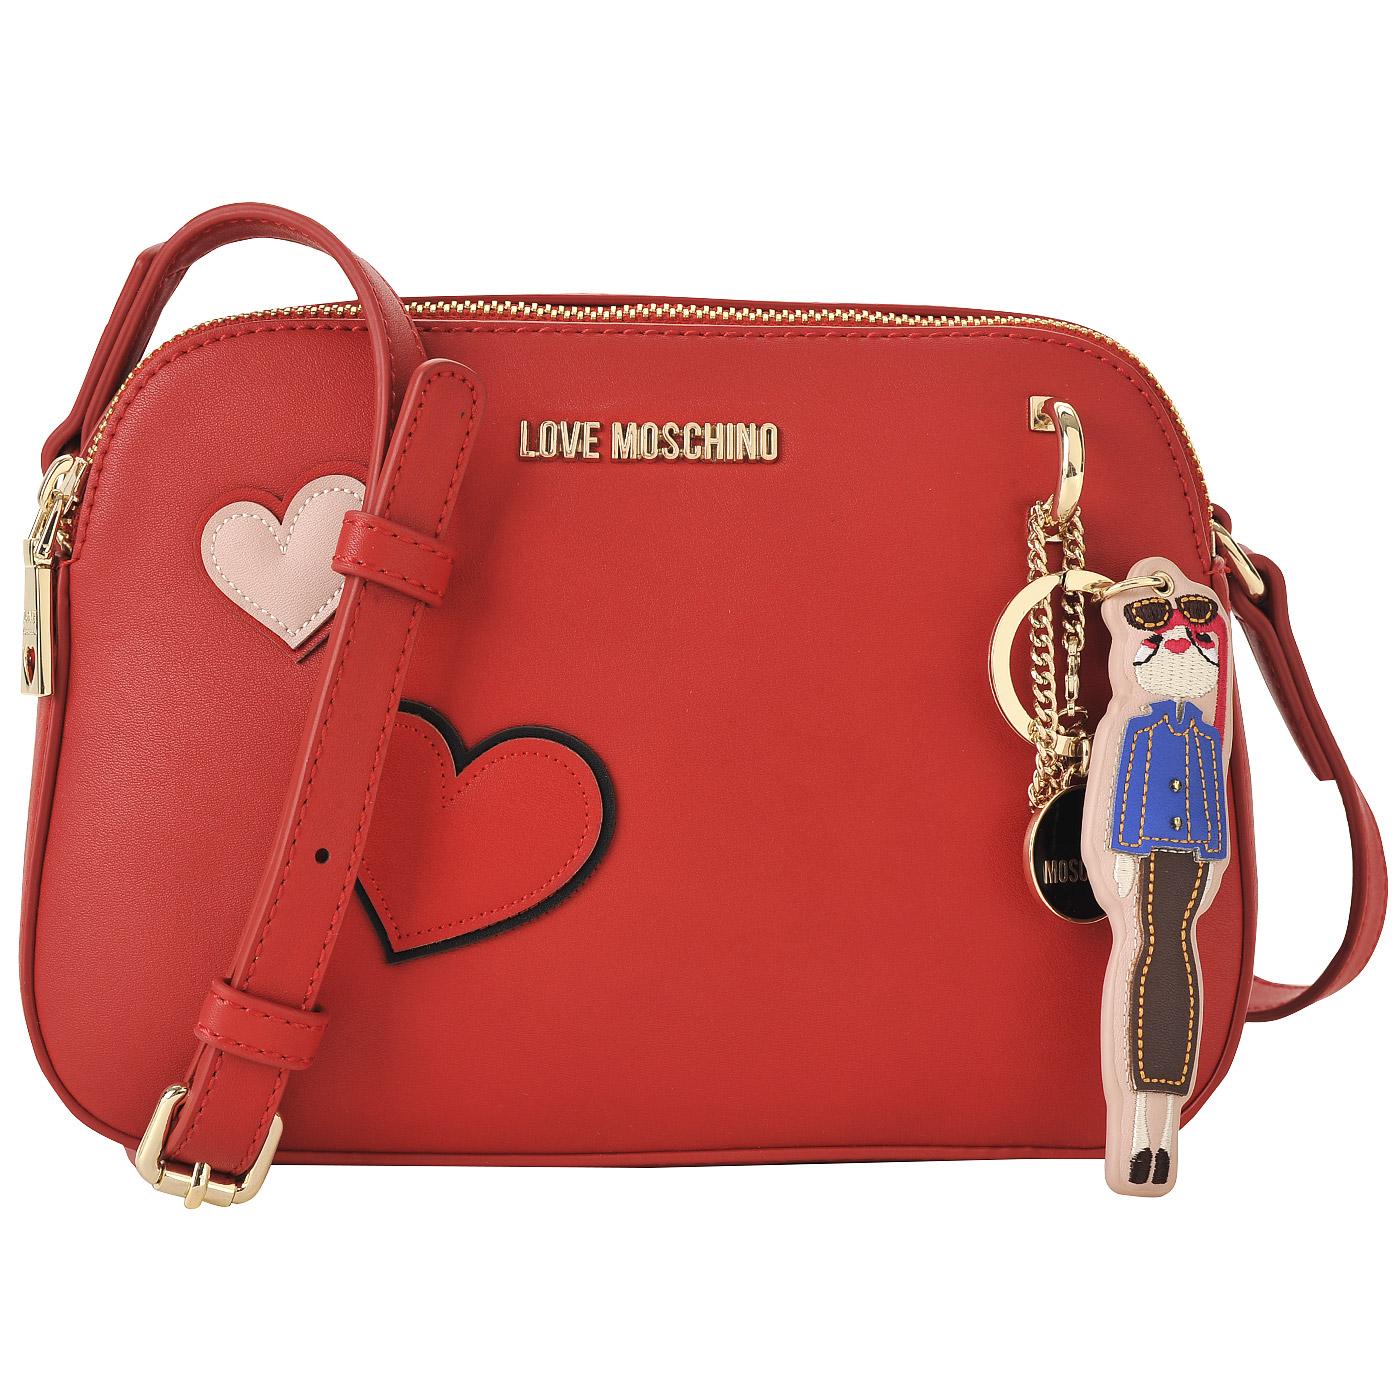 434f8d6a916d Красная сумка кросс-боди с аппликацией и съемным брелоком Love Moschino  Girls and hearts ...